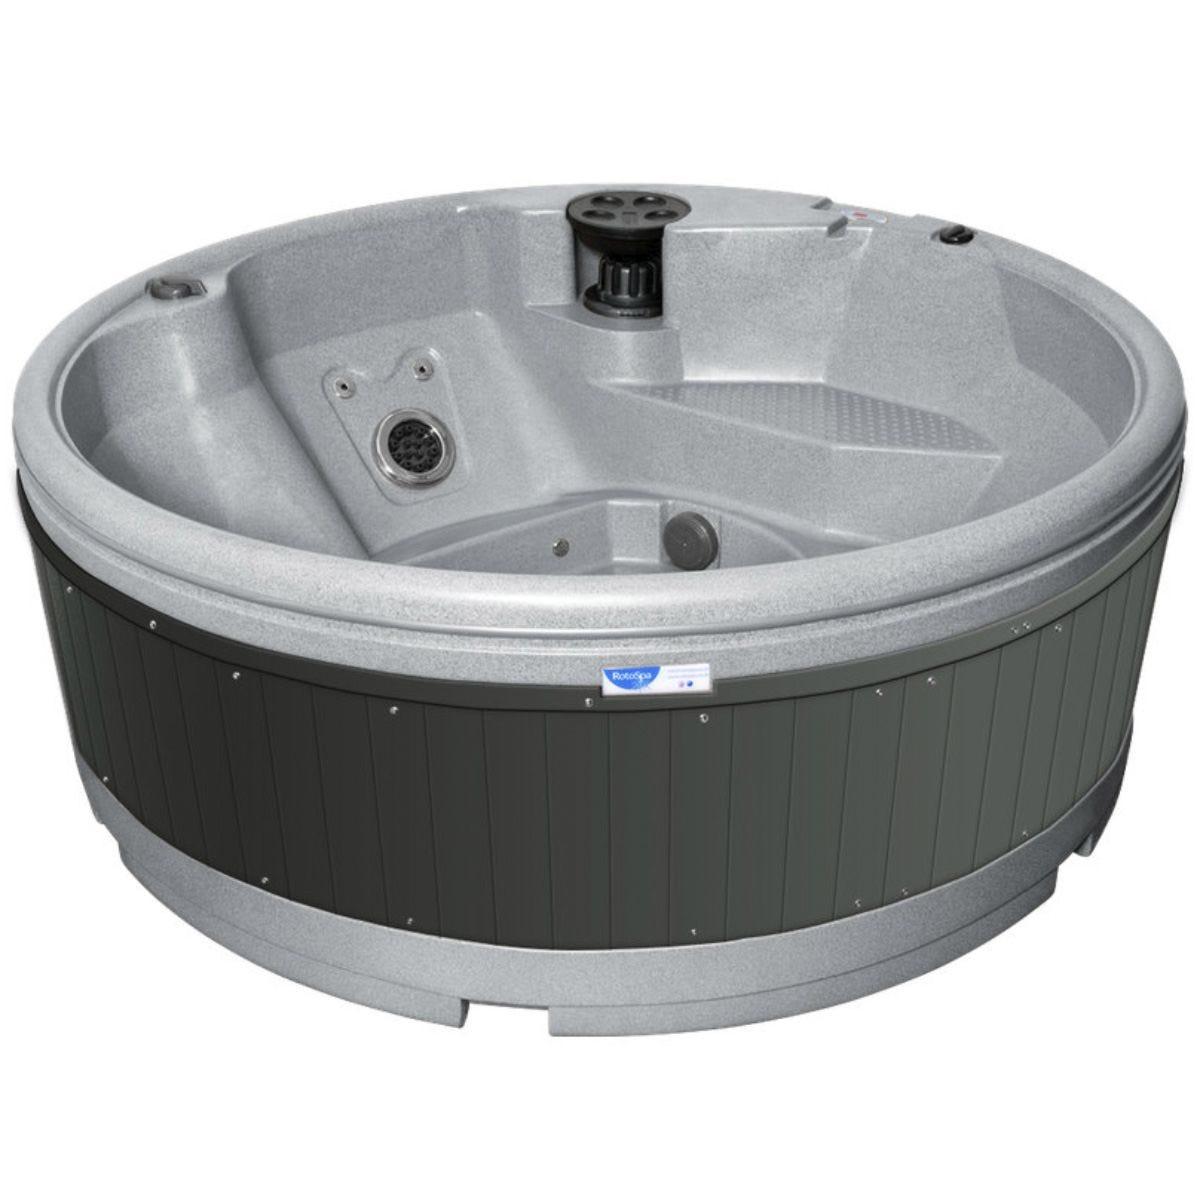 RotoSpa QuatroSpa Hot Tub - Light Grey